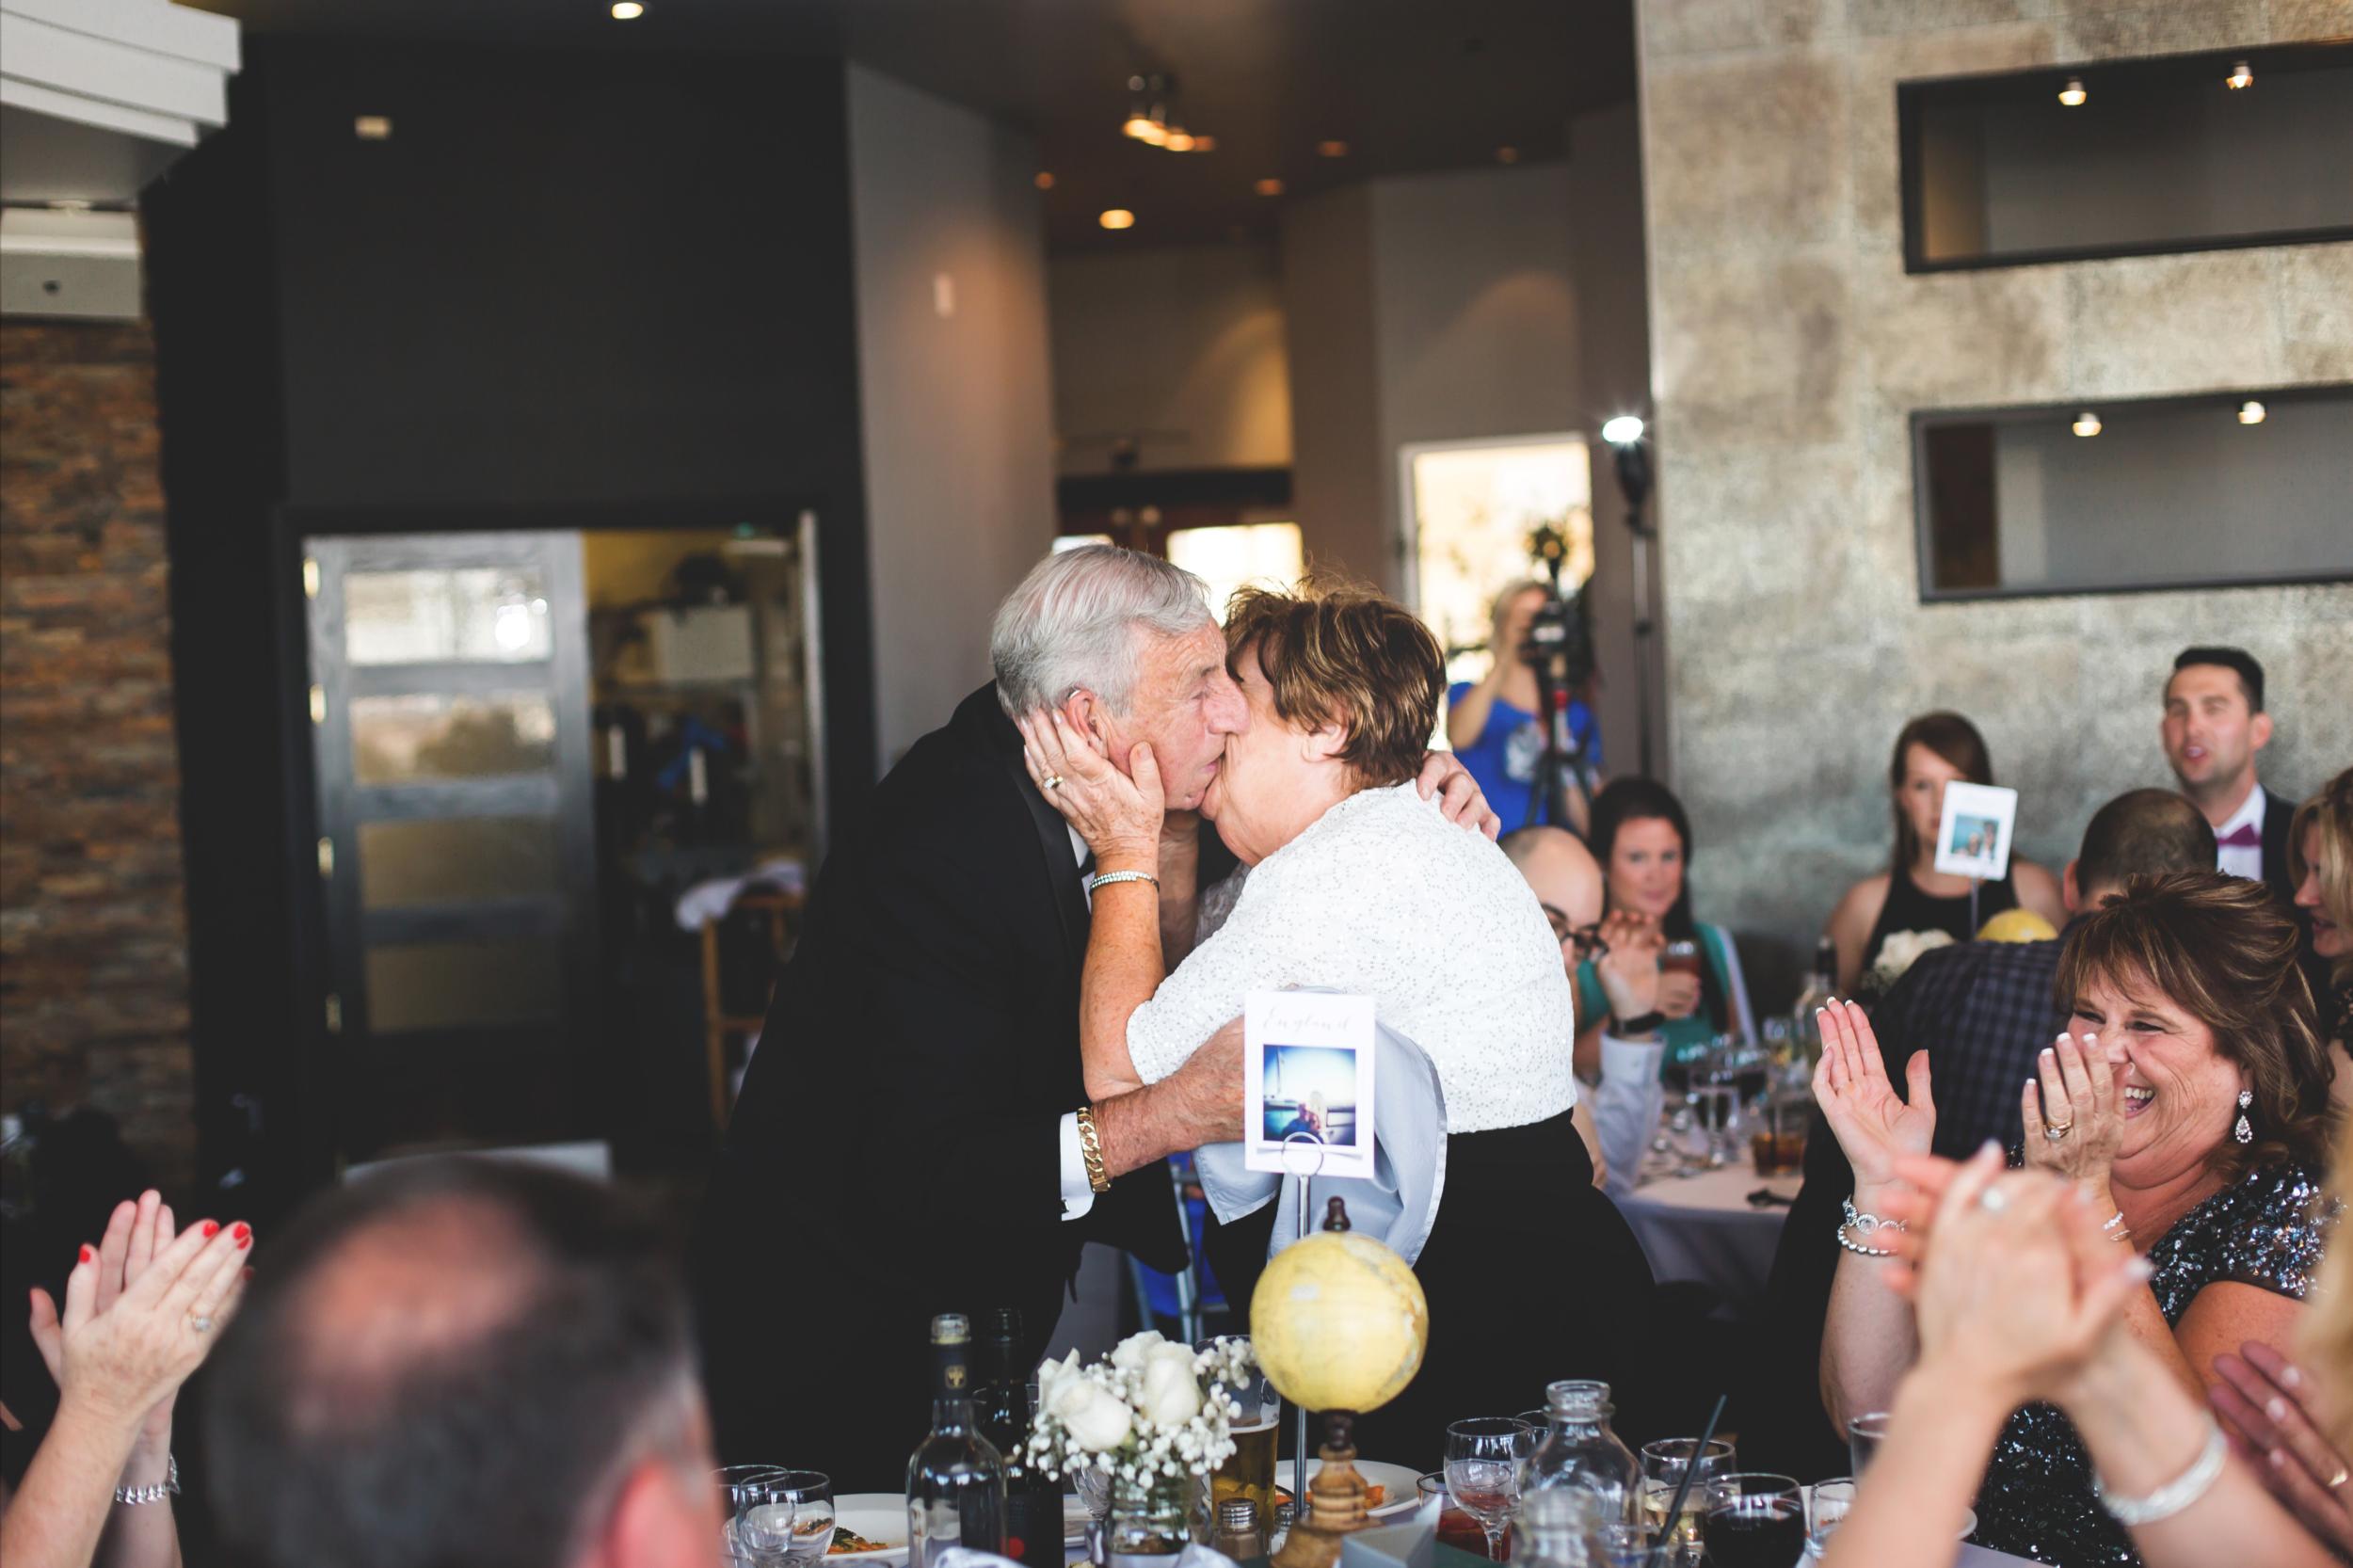 Wedding-Harbour-Banquet-Center-Oakville-Photographer-Wedding-Hamilton-Saint-James-Espresso-Downtown-HamOnt-GTA-Niagara-Toronto-Moments-by-Lauren-Photography-Photo-Image-59.png